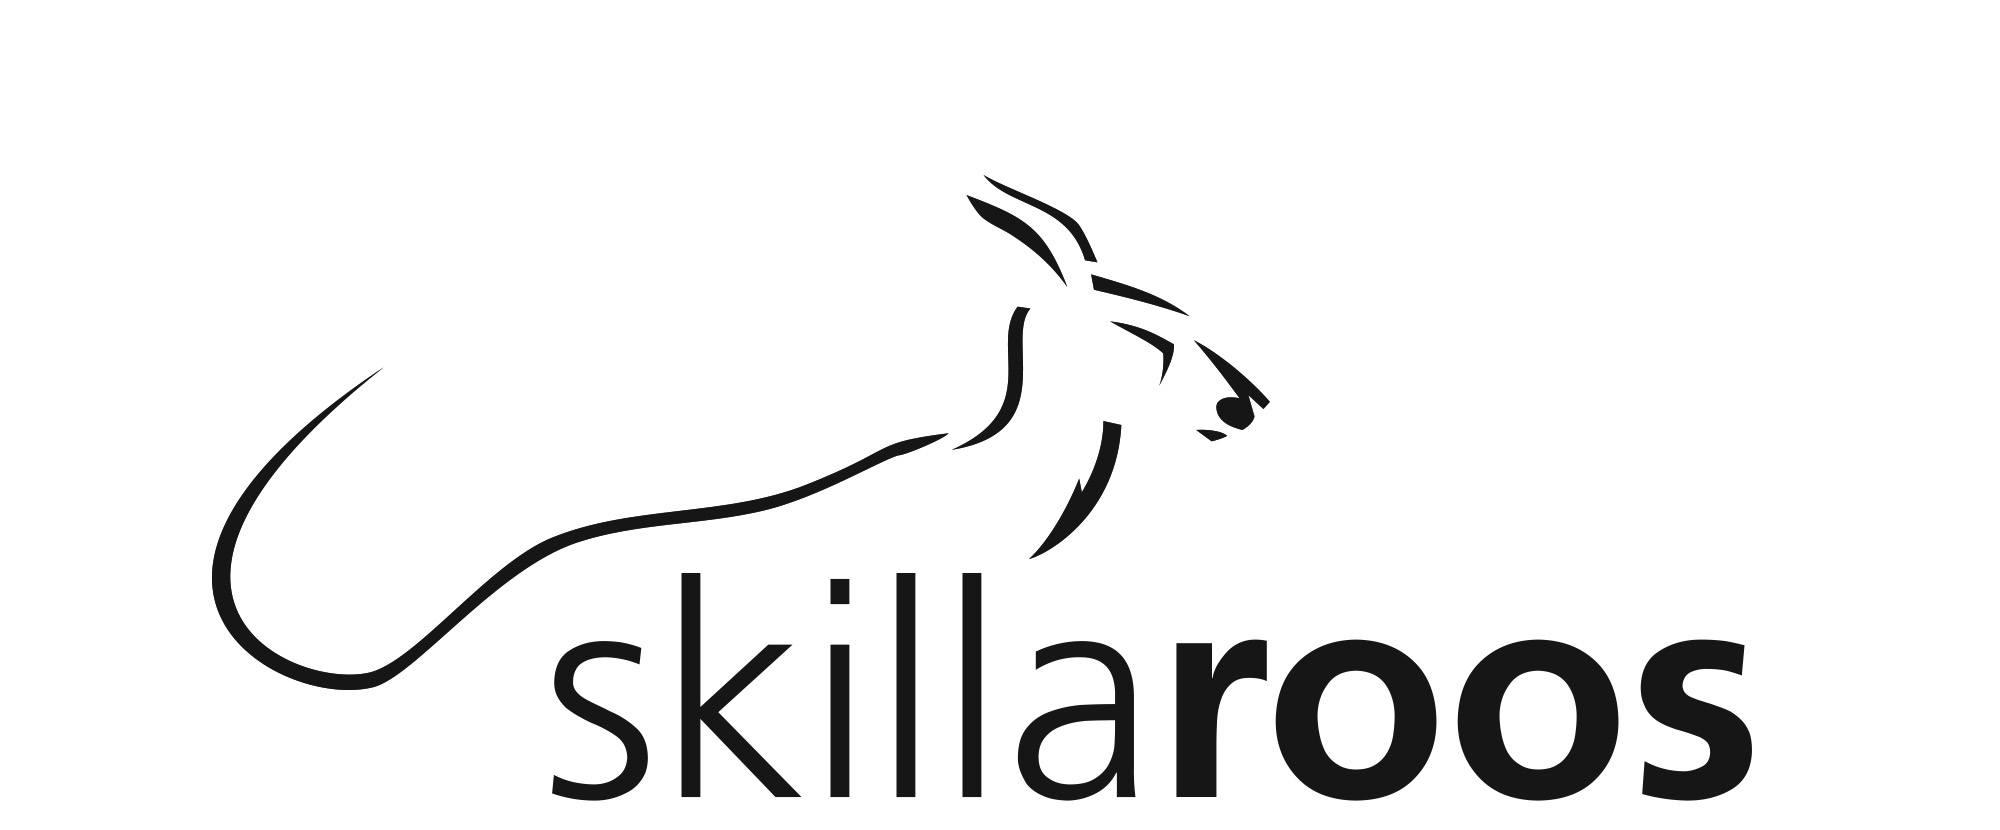 You searched for team australia - WorldSkills Australia